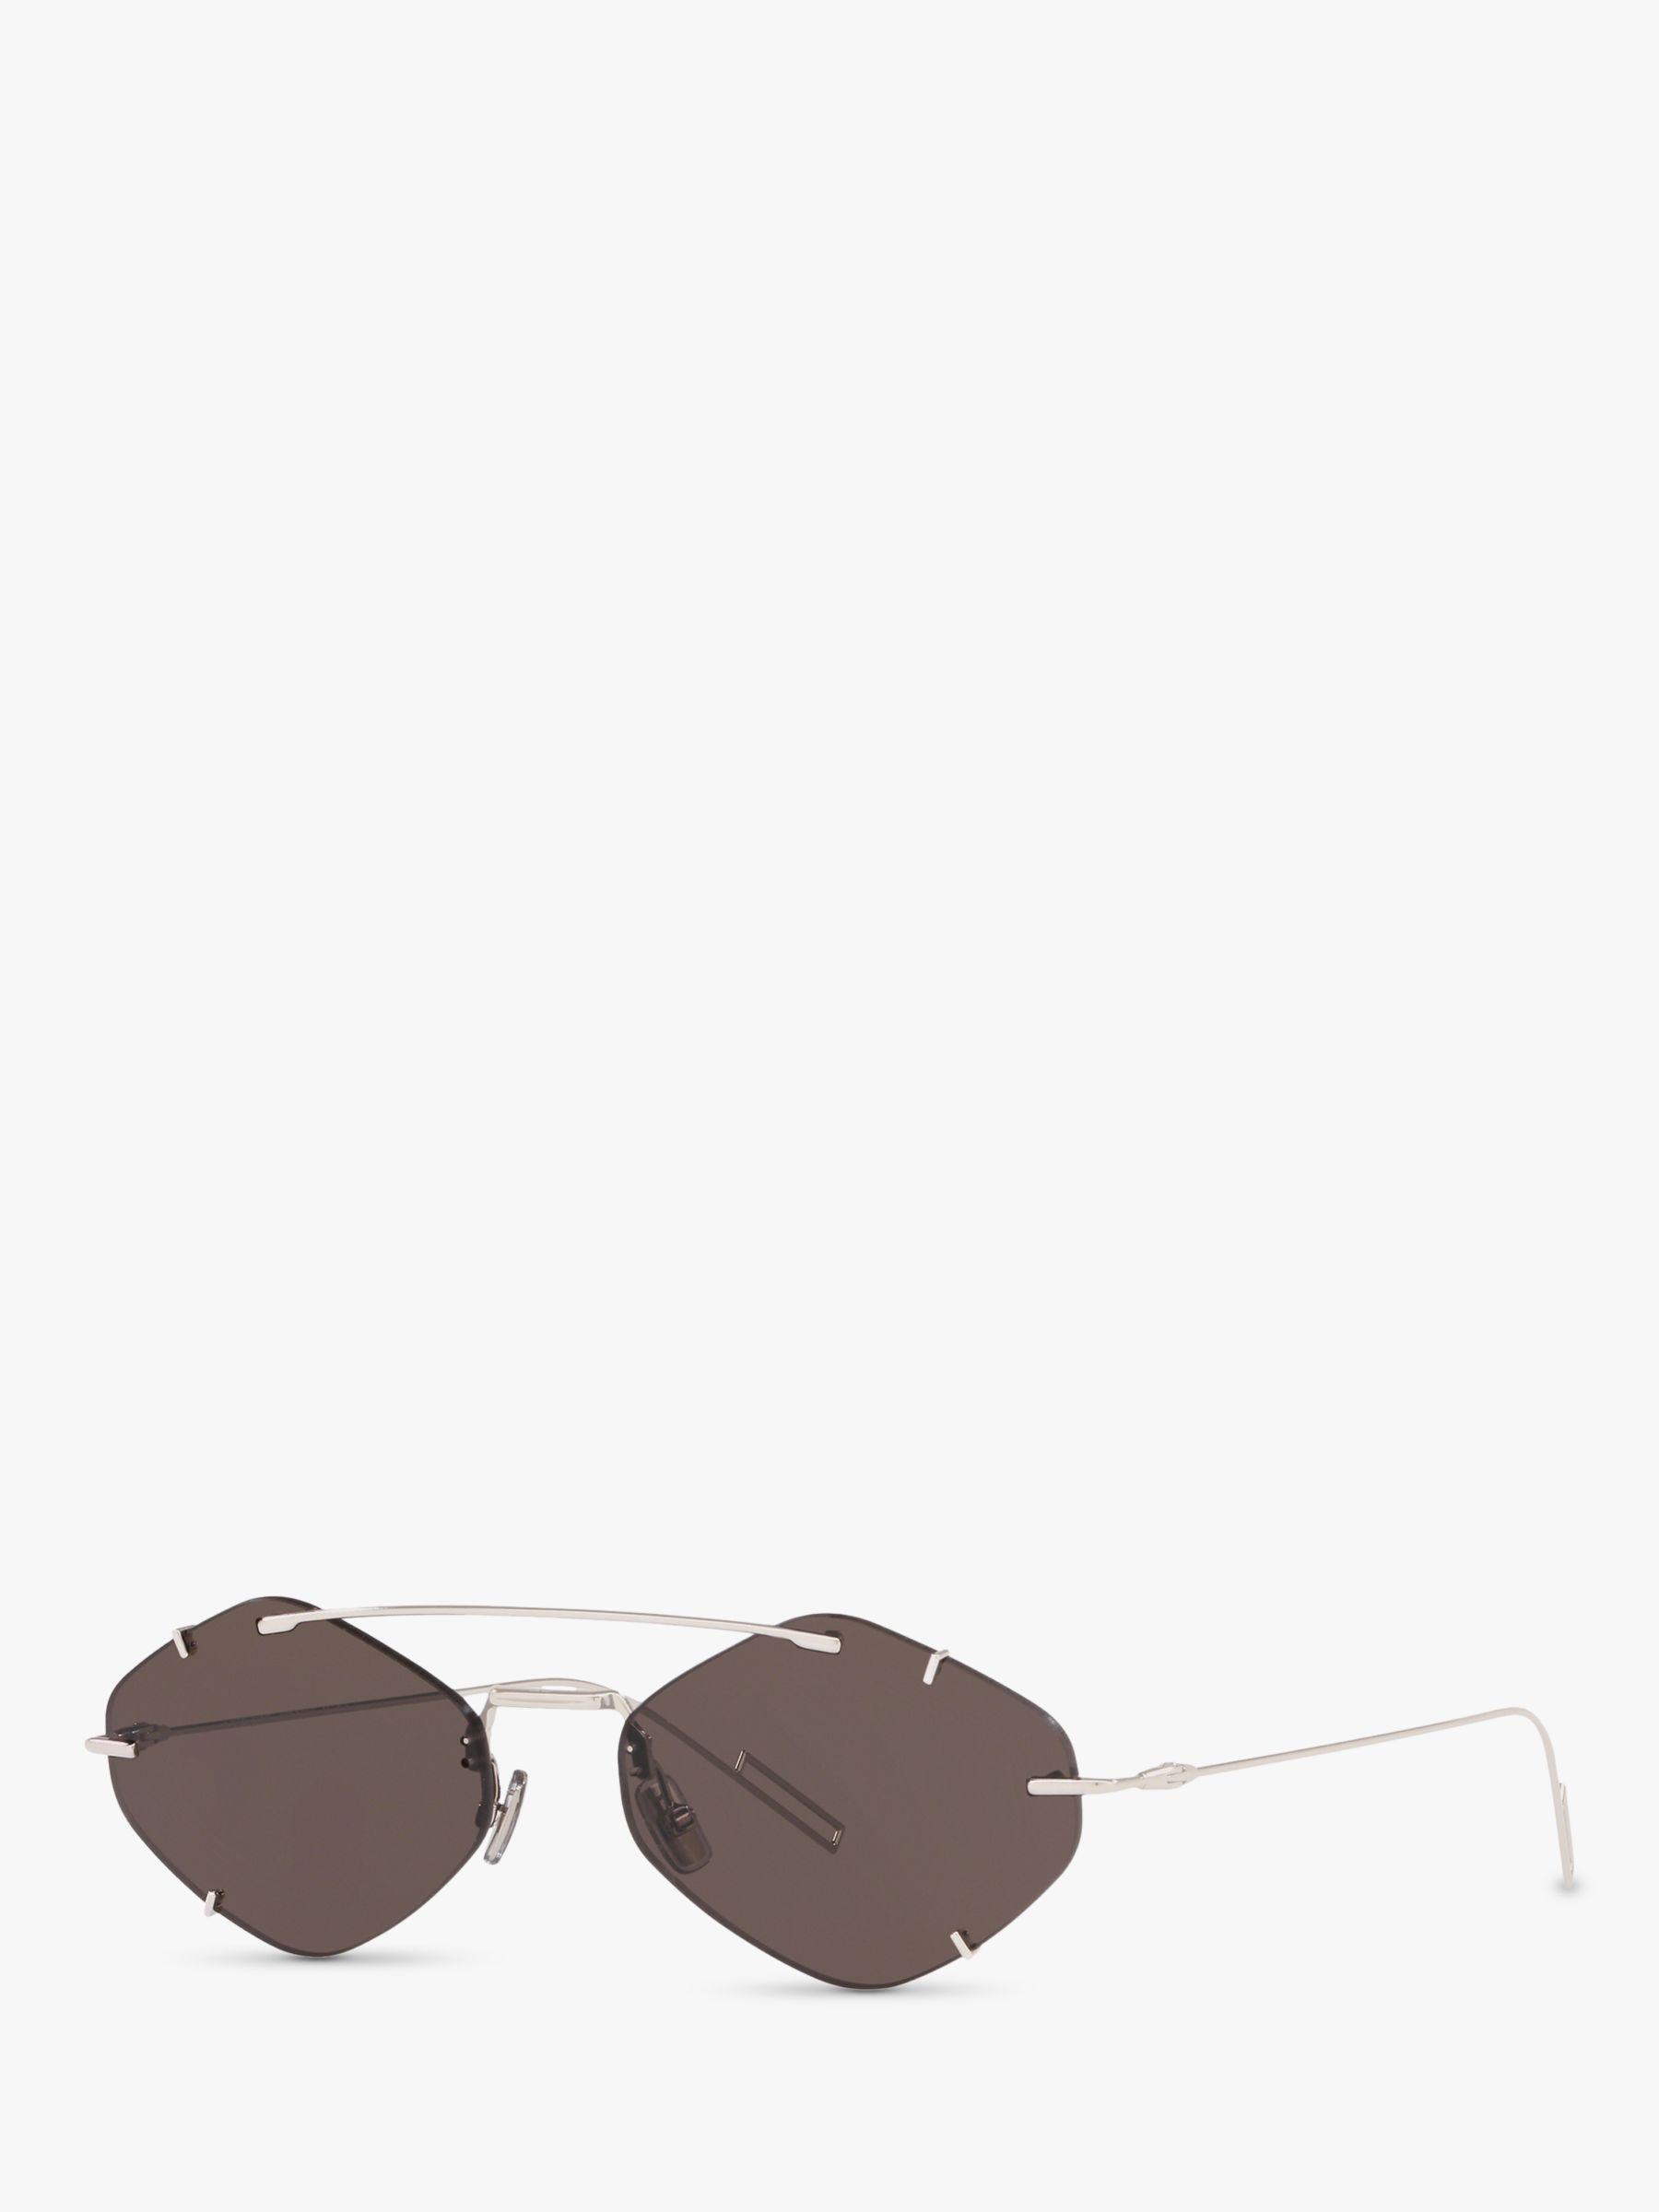 e7a222633f8 Dior - Metallic Inclusion Men s Asymmetric Sunglasses for Men - Lyst. View  fullscreen